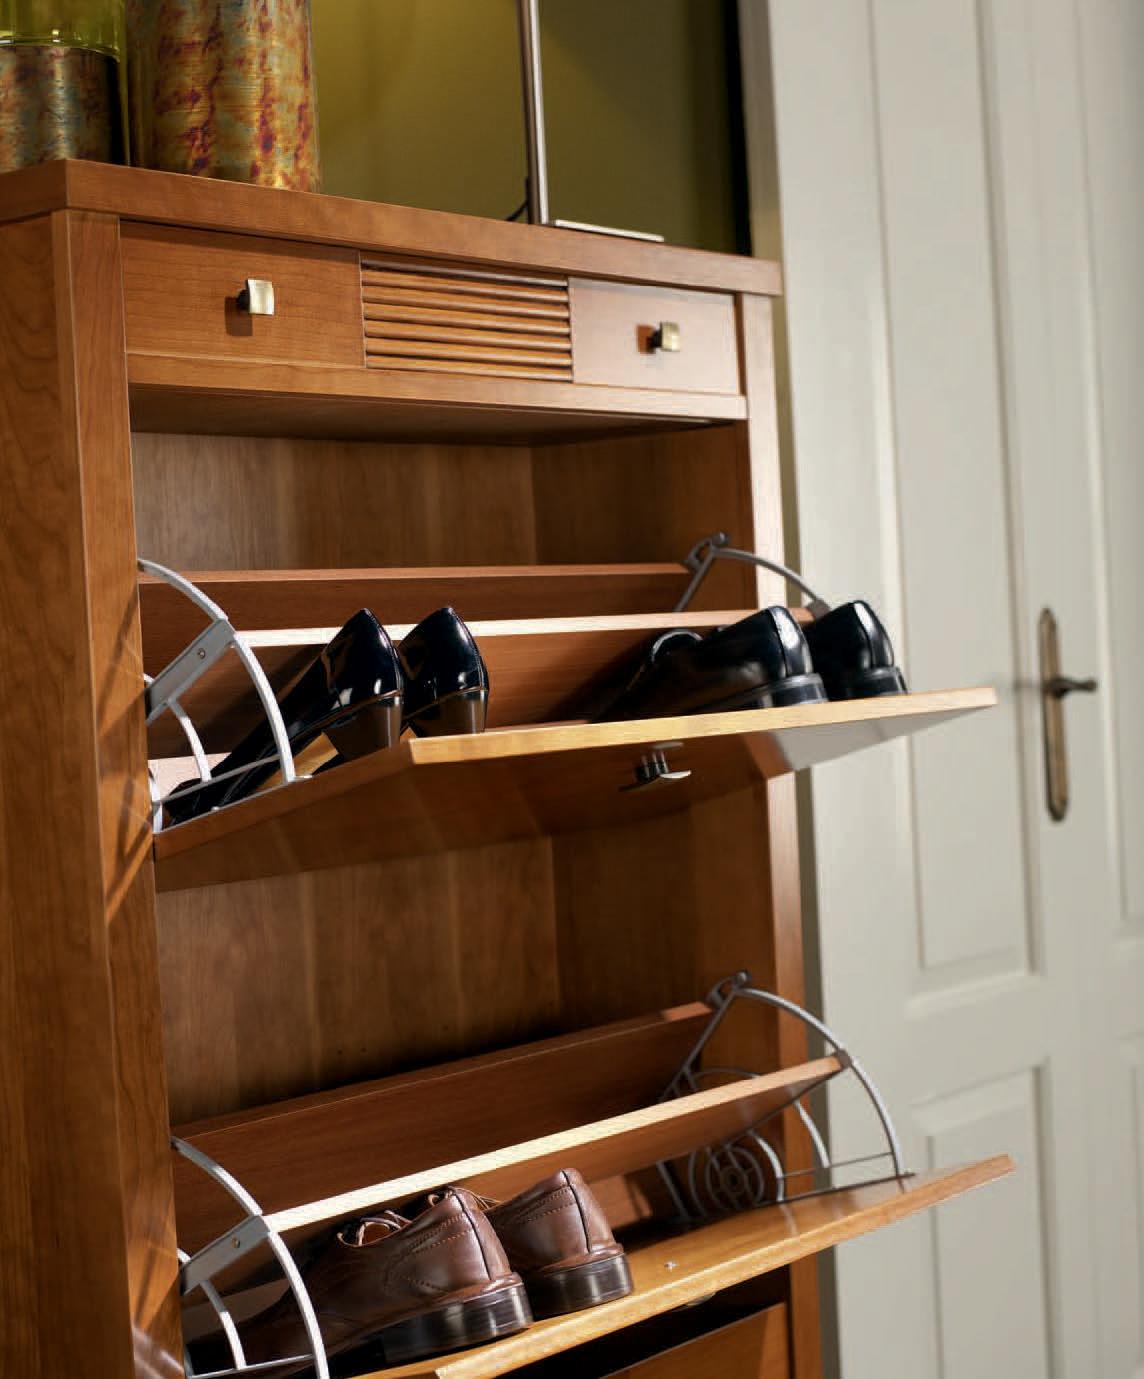 Шкаф для обуви panamar 543.000.p в мебельных салонах le tabo.